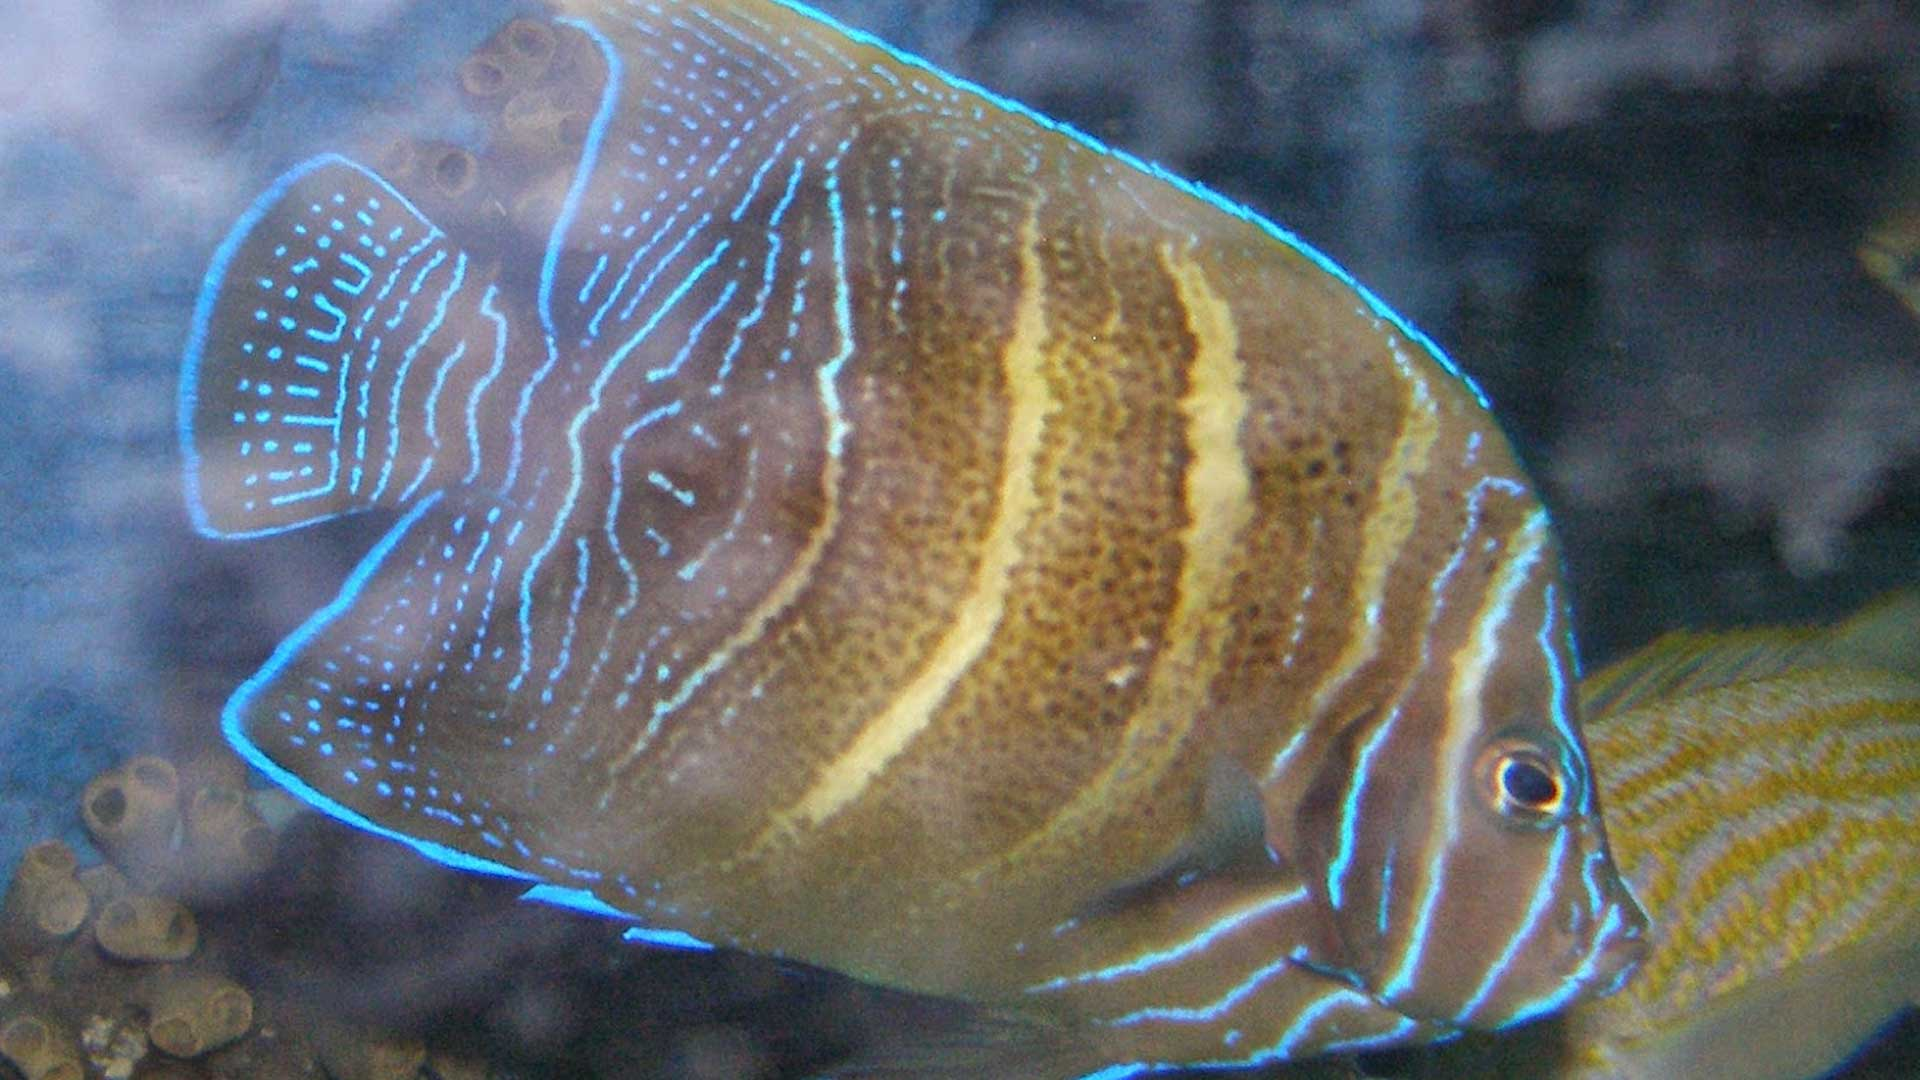 Figure 5.  Angelfish (~2 years old) on display at SeaWorld San Antonio. Figure 4 and 5 are the same fish.  Photo credit: Nick Ireland.